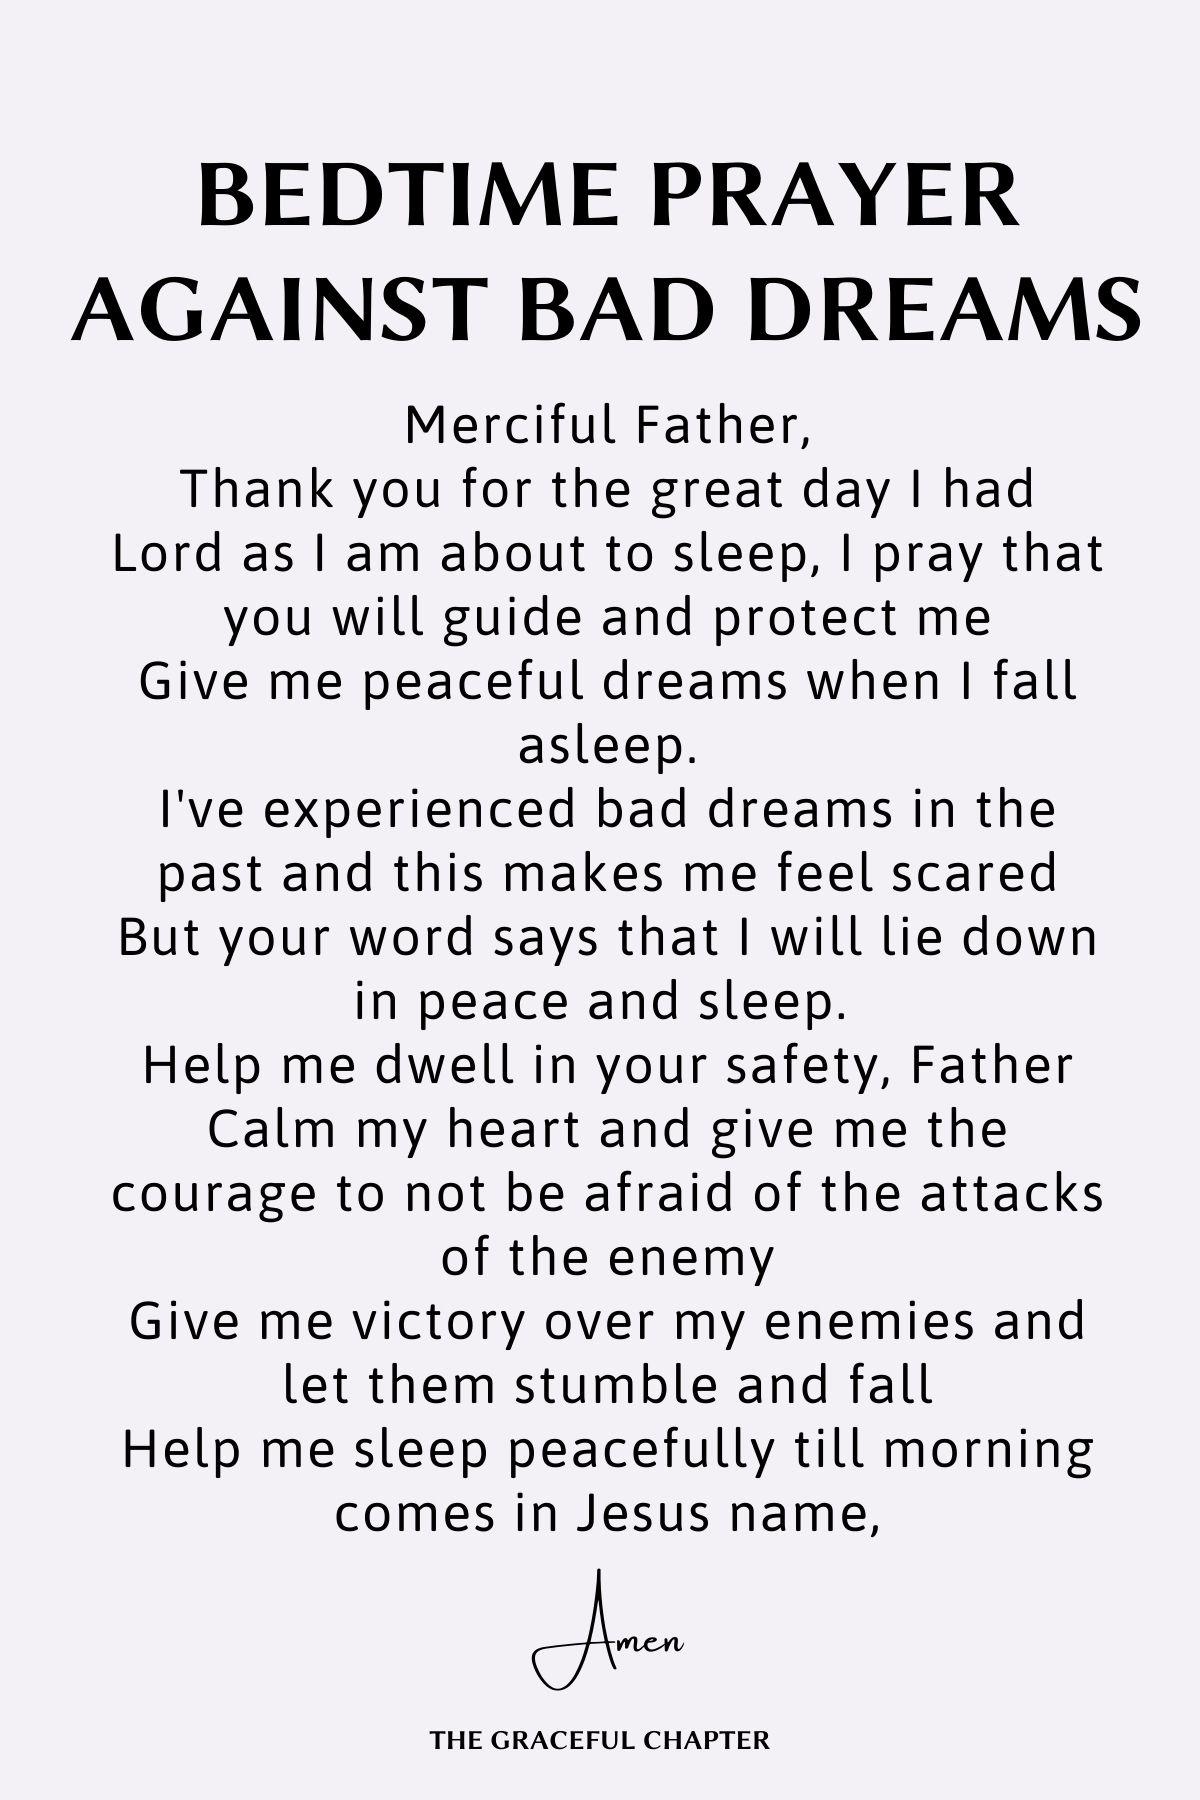 Bedtime prayer against bad dreams